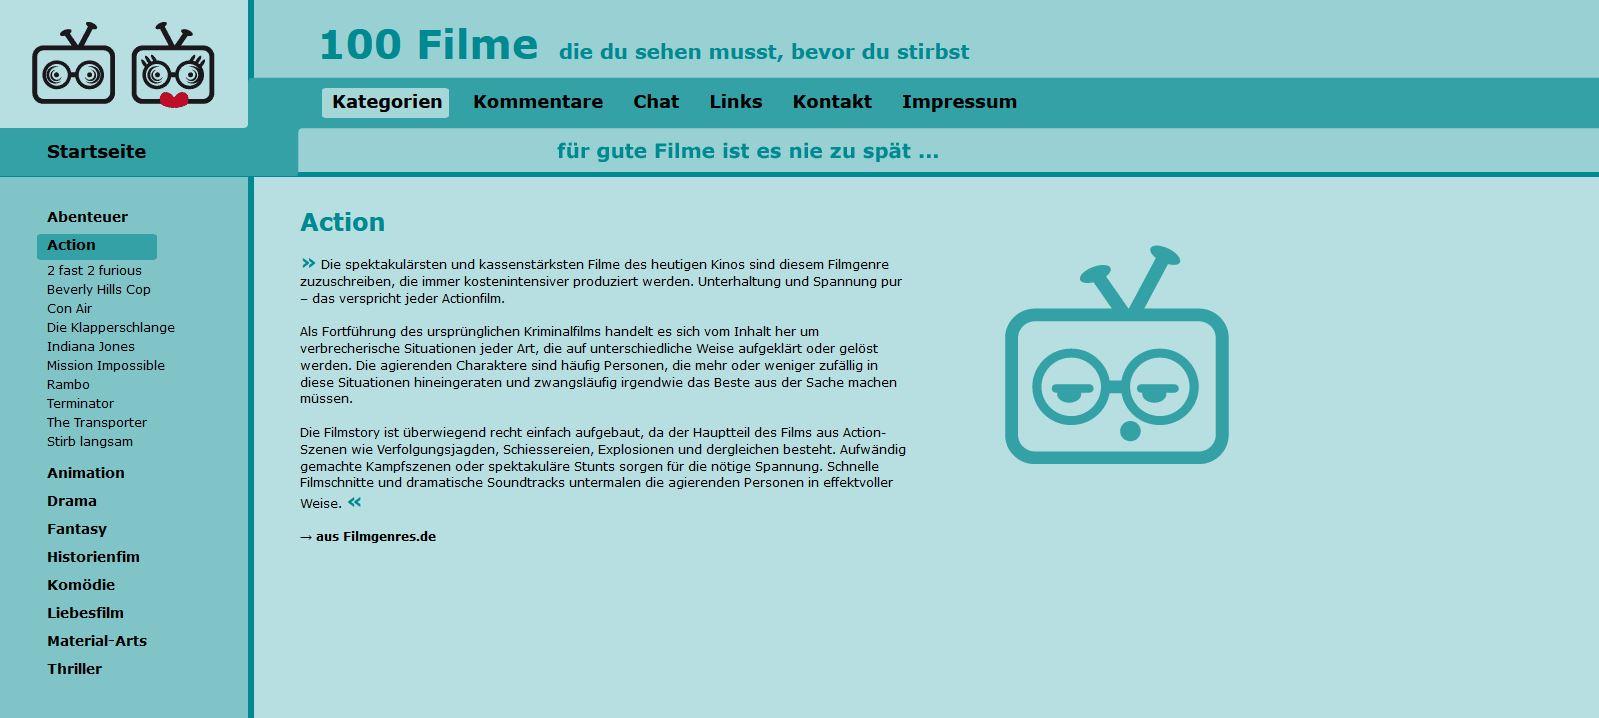 100 Filme - Kategorien - Action